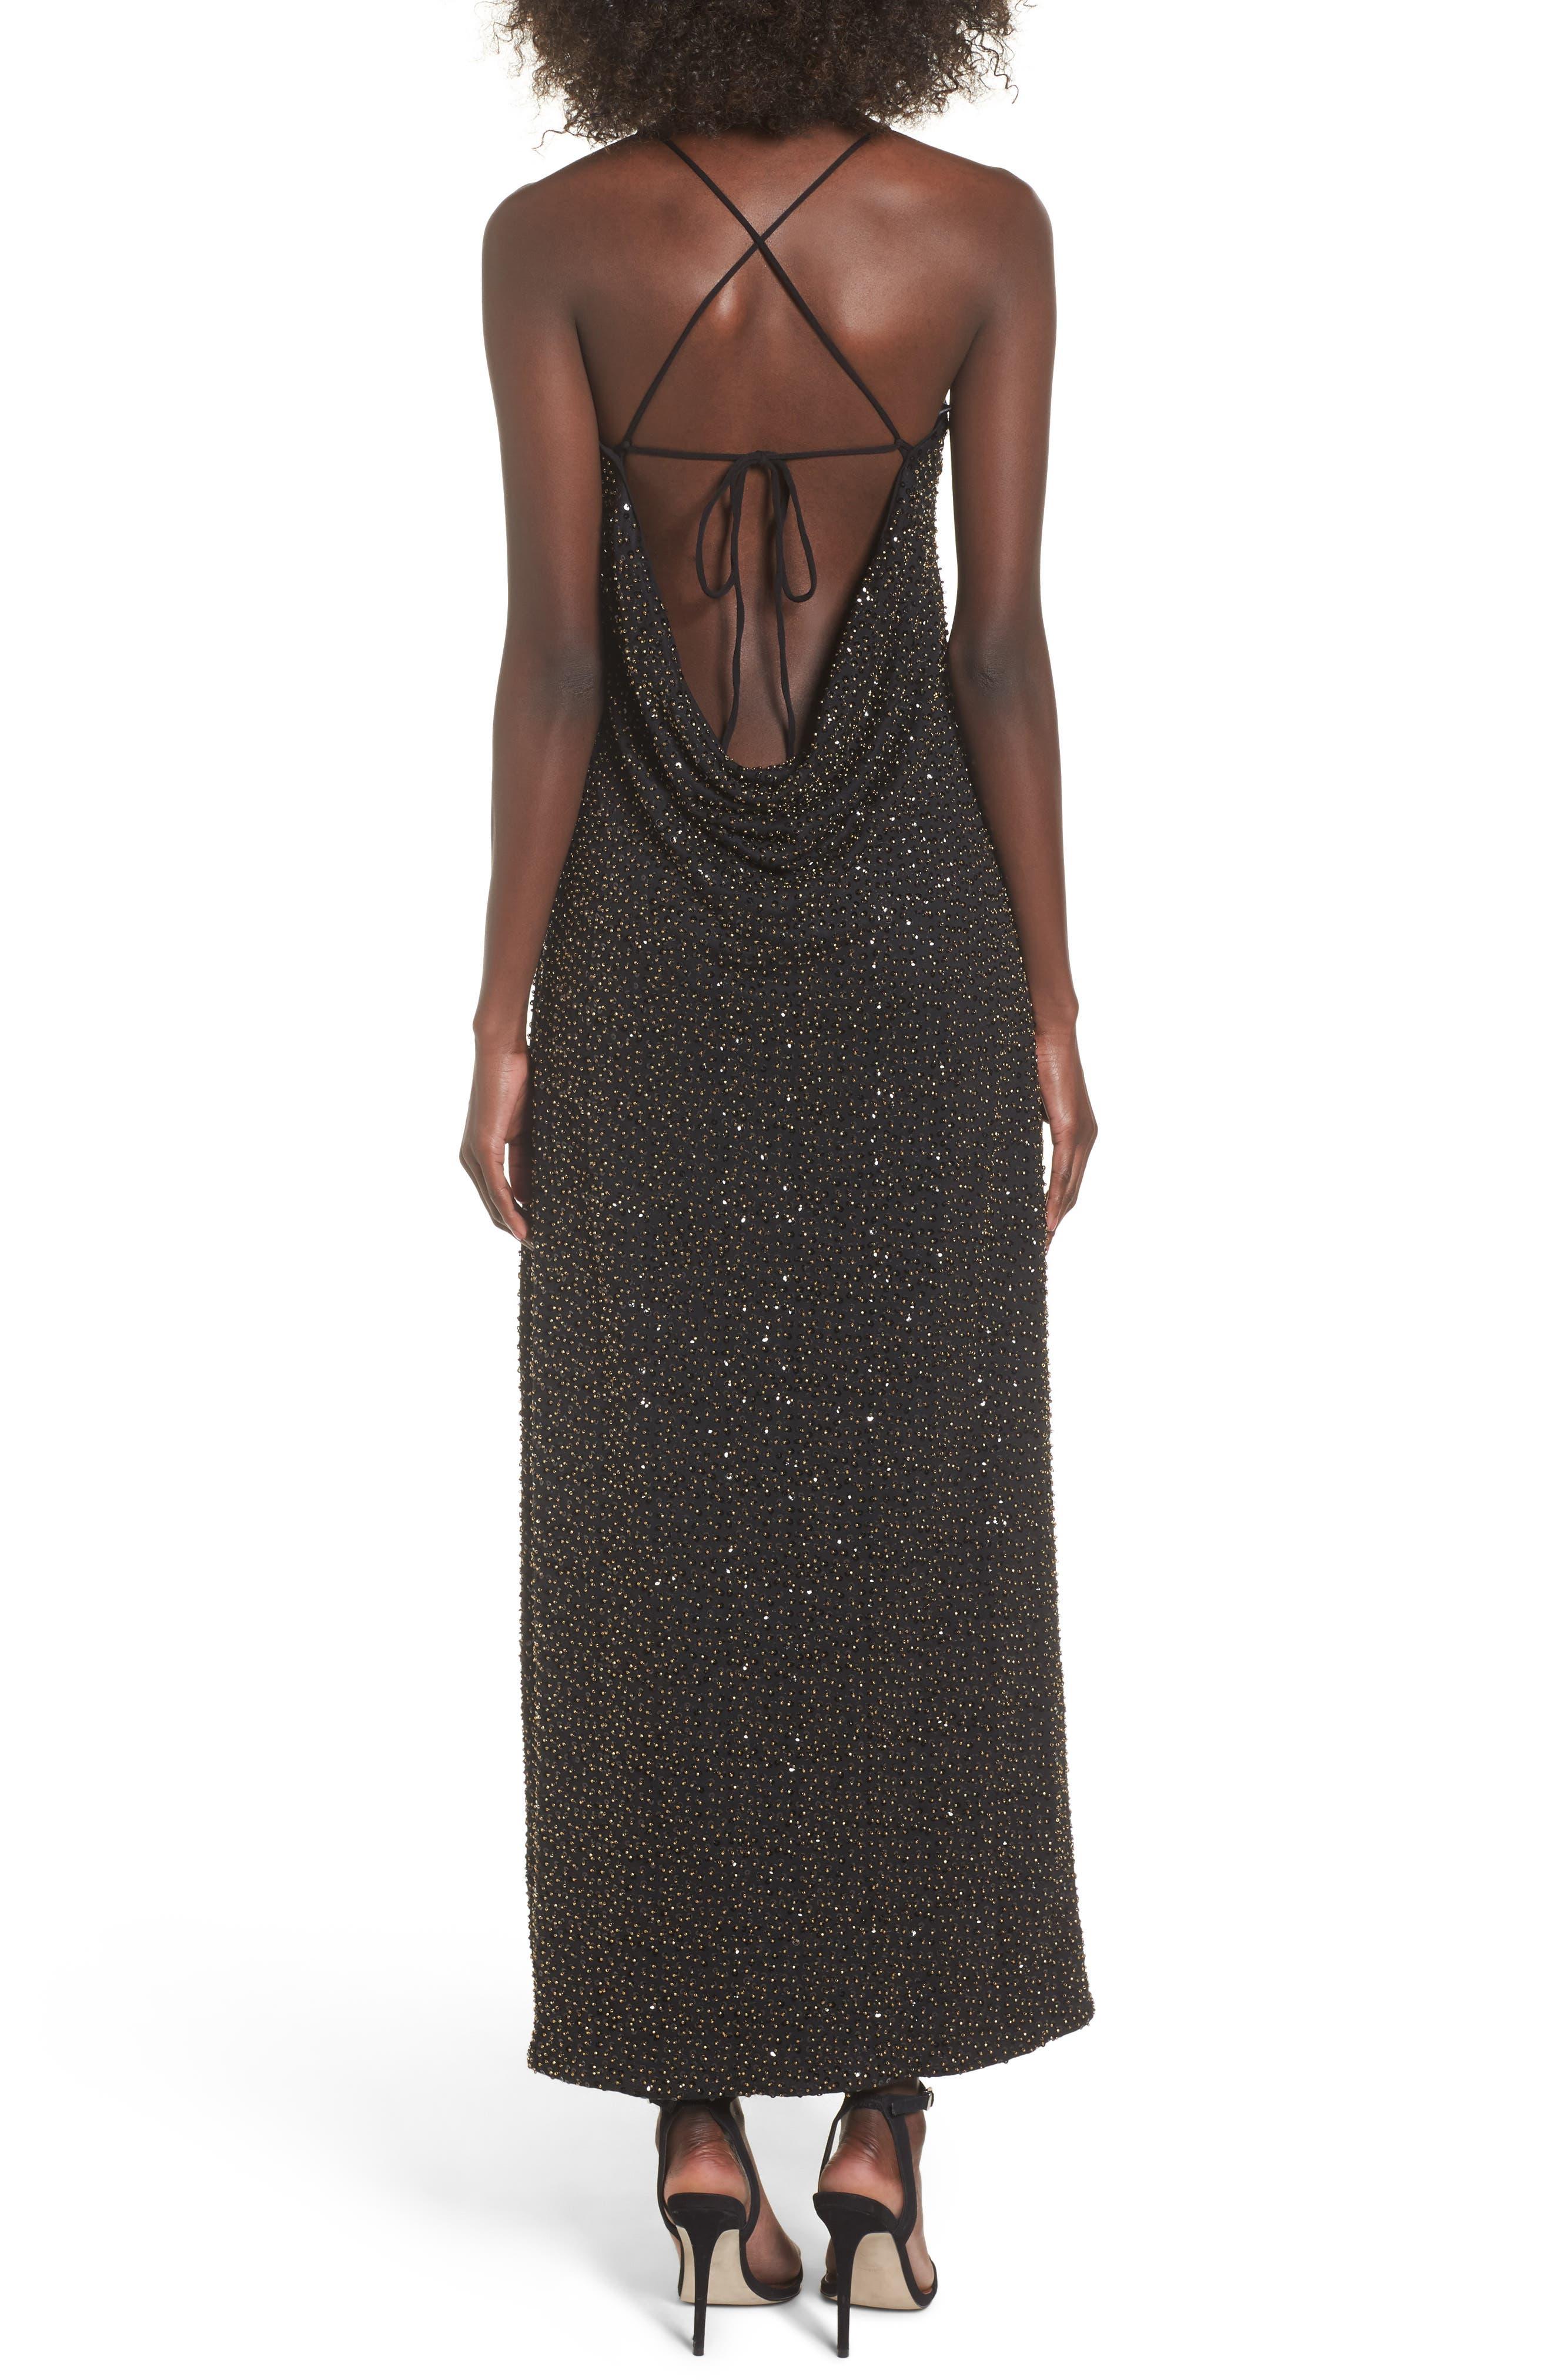 Gracen Maxi Dress,                             Alternate thumbnail 2, color,                             Black/ Brass